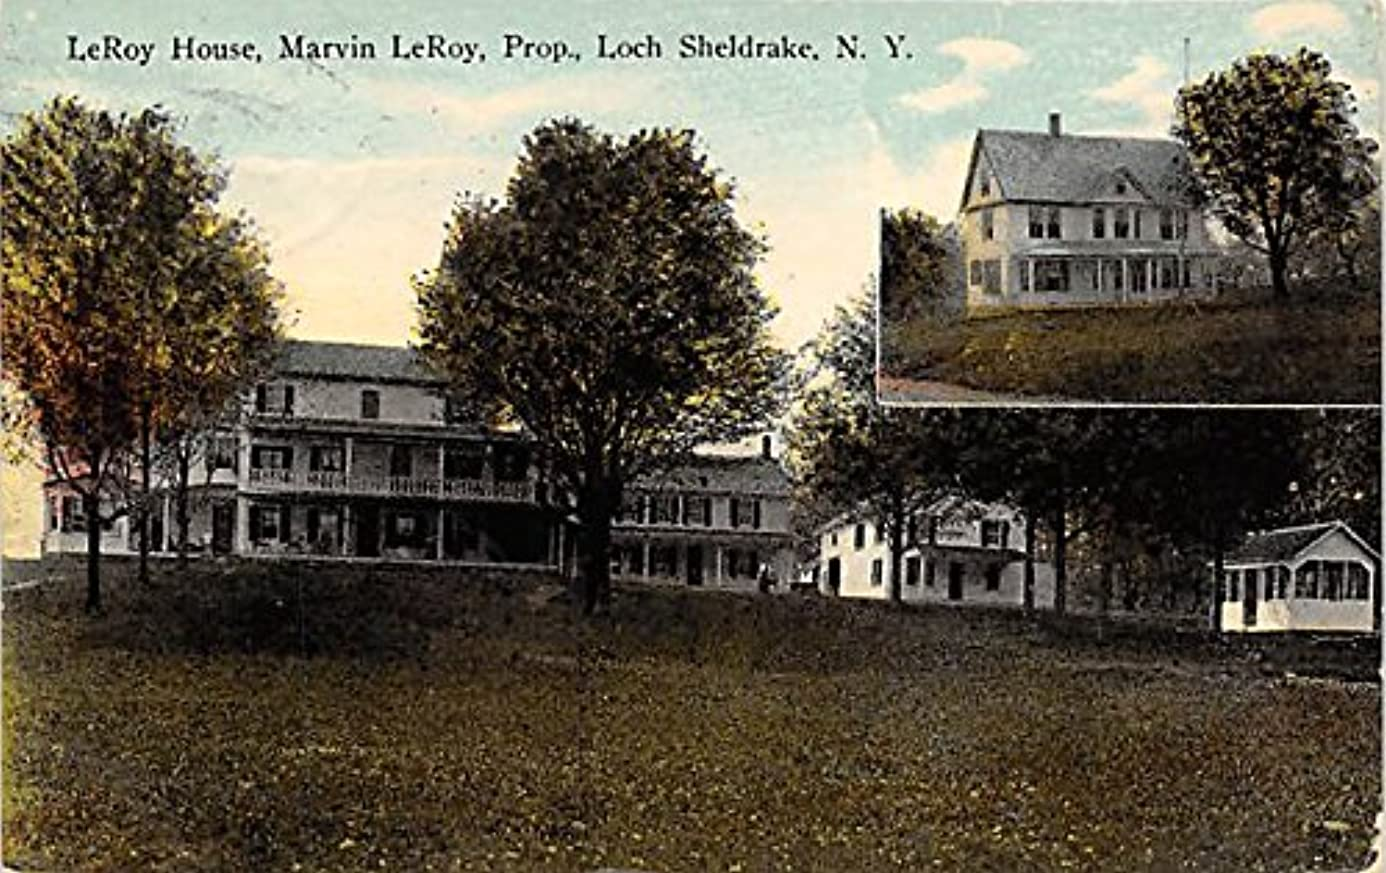 LeRoy House Marvin Le Roy Prop Loch Sheldrake, New York, Postcard kwe1536048